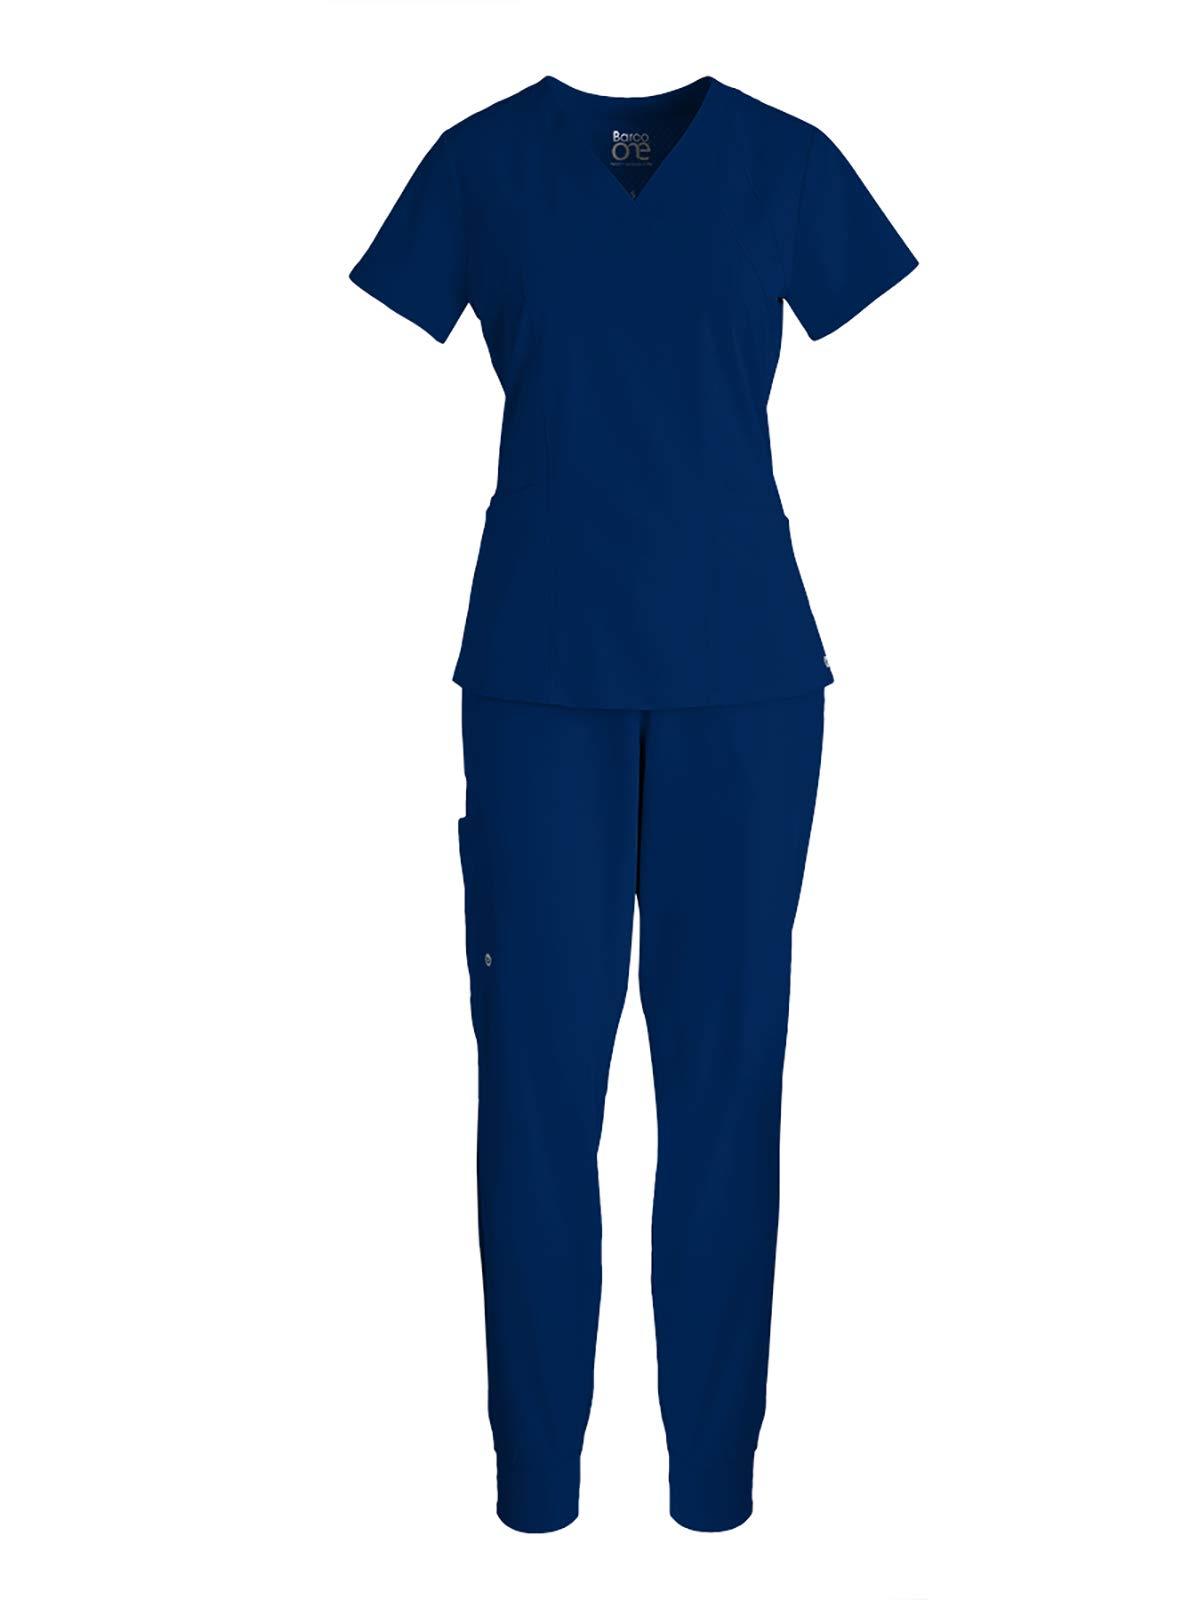 BARCO One Bundle – V-Neck Top + Boost Jogger Pant Medical Scrub Set for Women